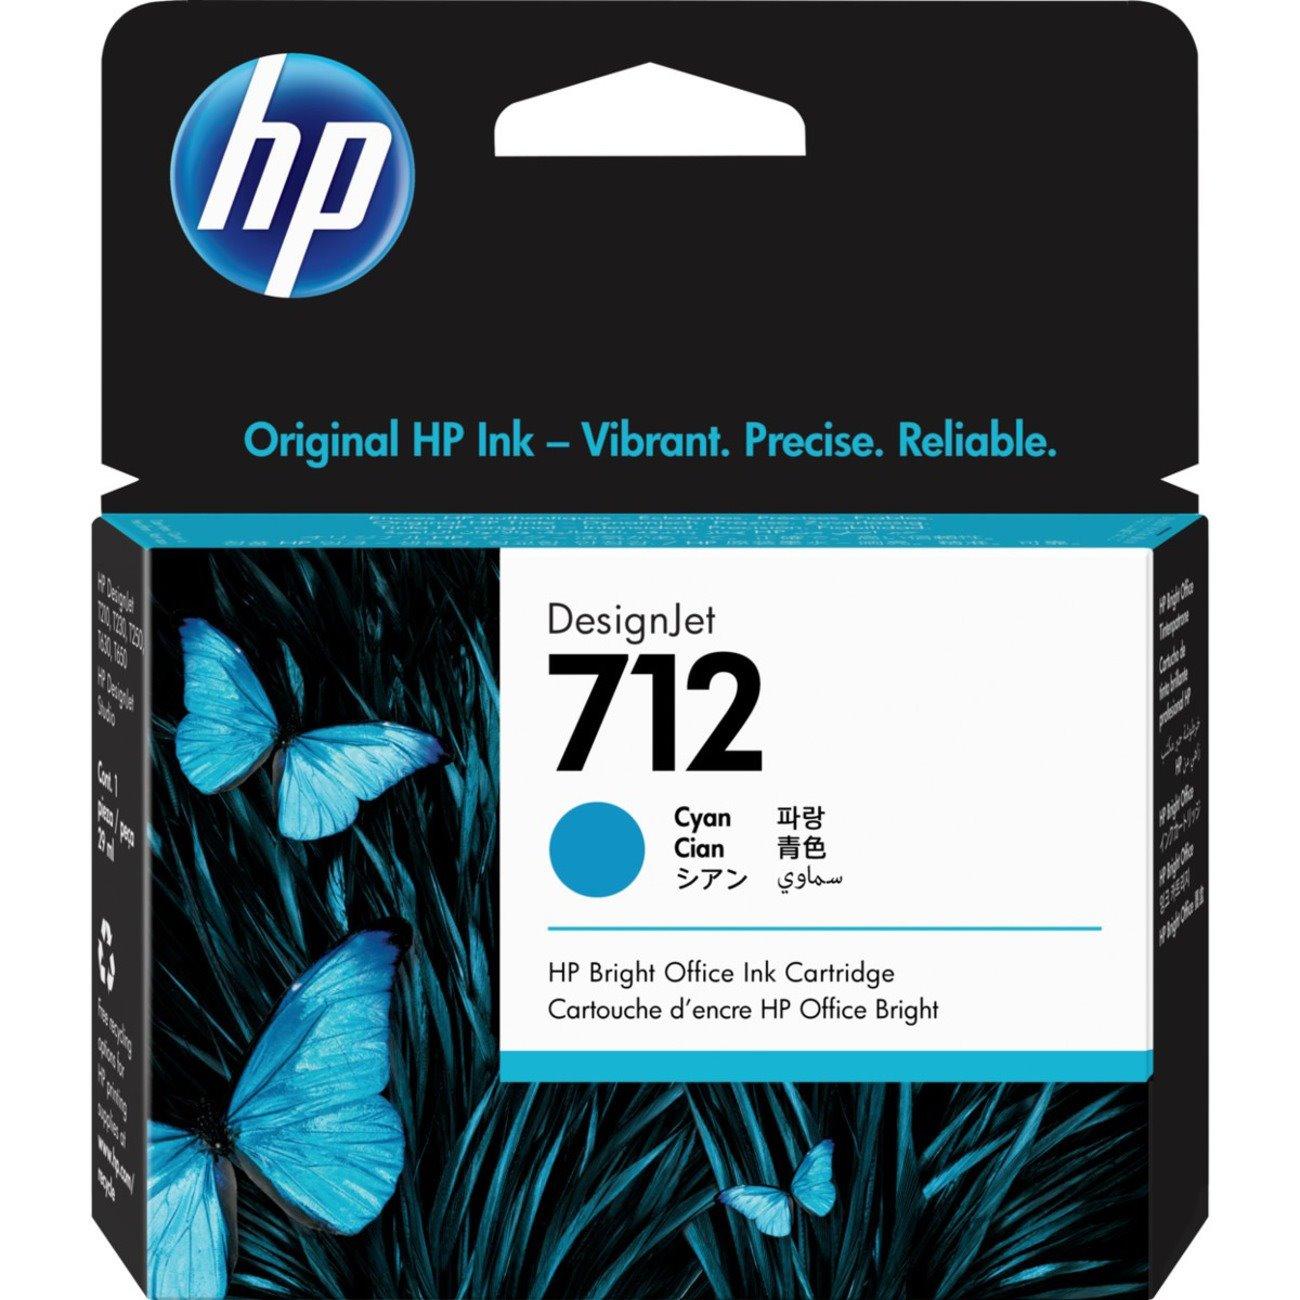 HP 712 Original Ink Cartridge - Cyan